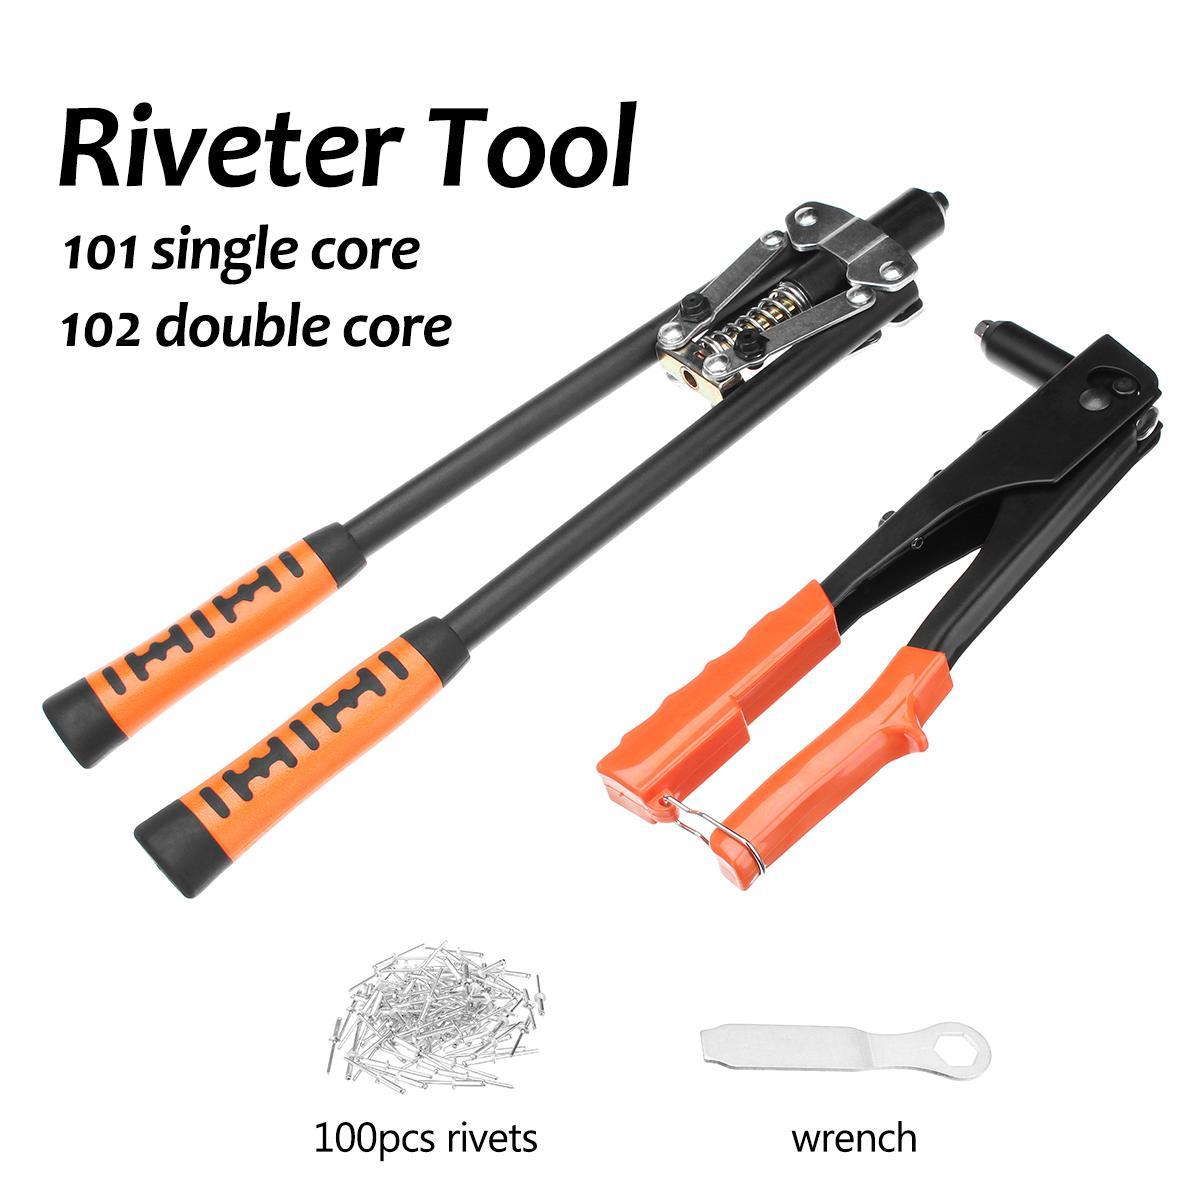 1pc Hand Riveter 101 Single Core/102 Double Core Pulling Handle Riveting Machine Riveter Tool + 100Pcs Assorted Rivets Kit